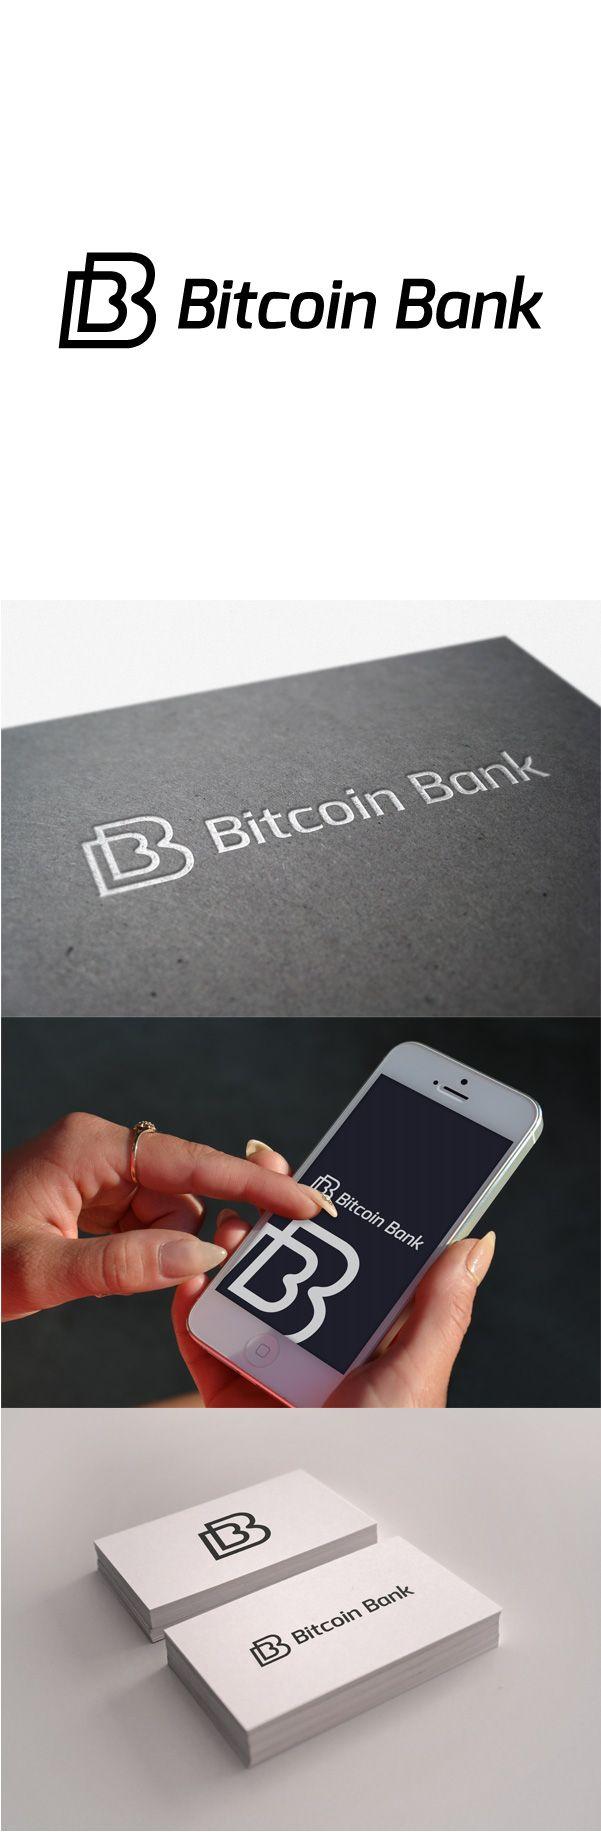 BitcoinBank - Логотип - дизайнер Jexx07